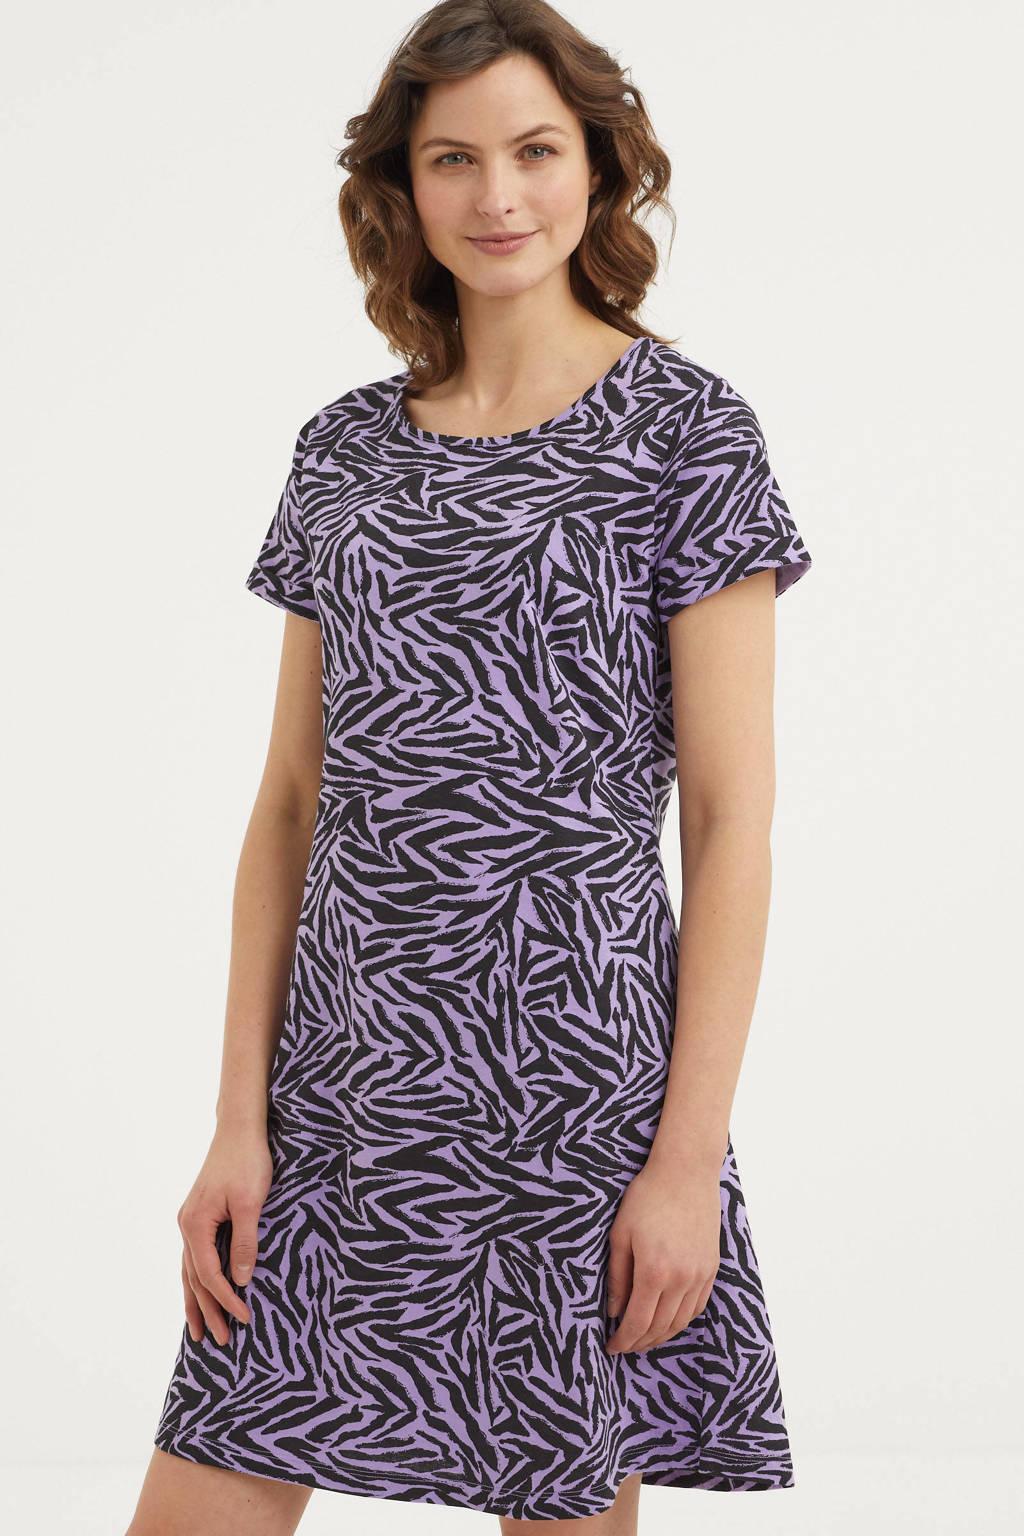 Dreamcovers nachthemd met zebraprint lila/zwart, Lila/zwart